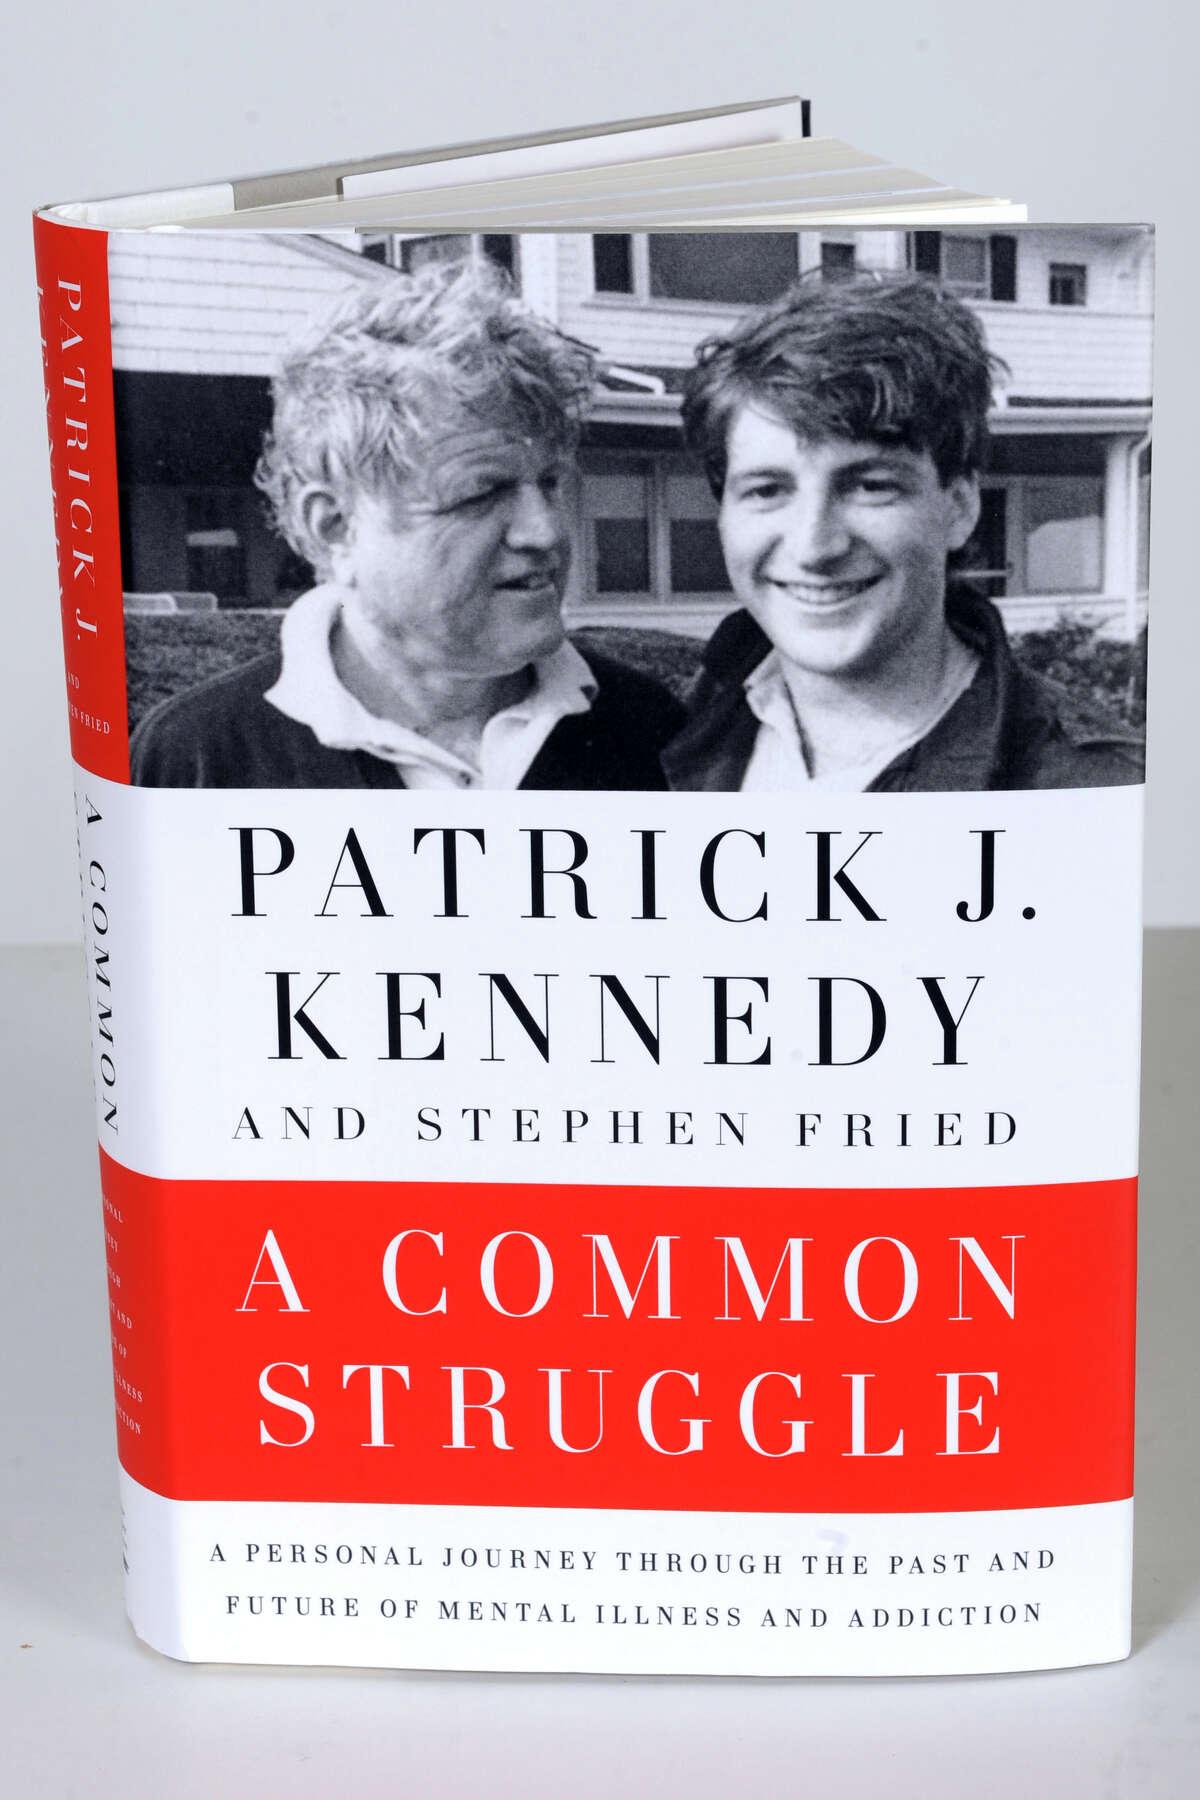 Patrick Kennedy's memoir, A Common Struggle.